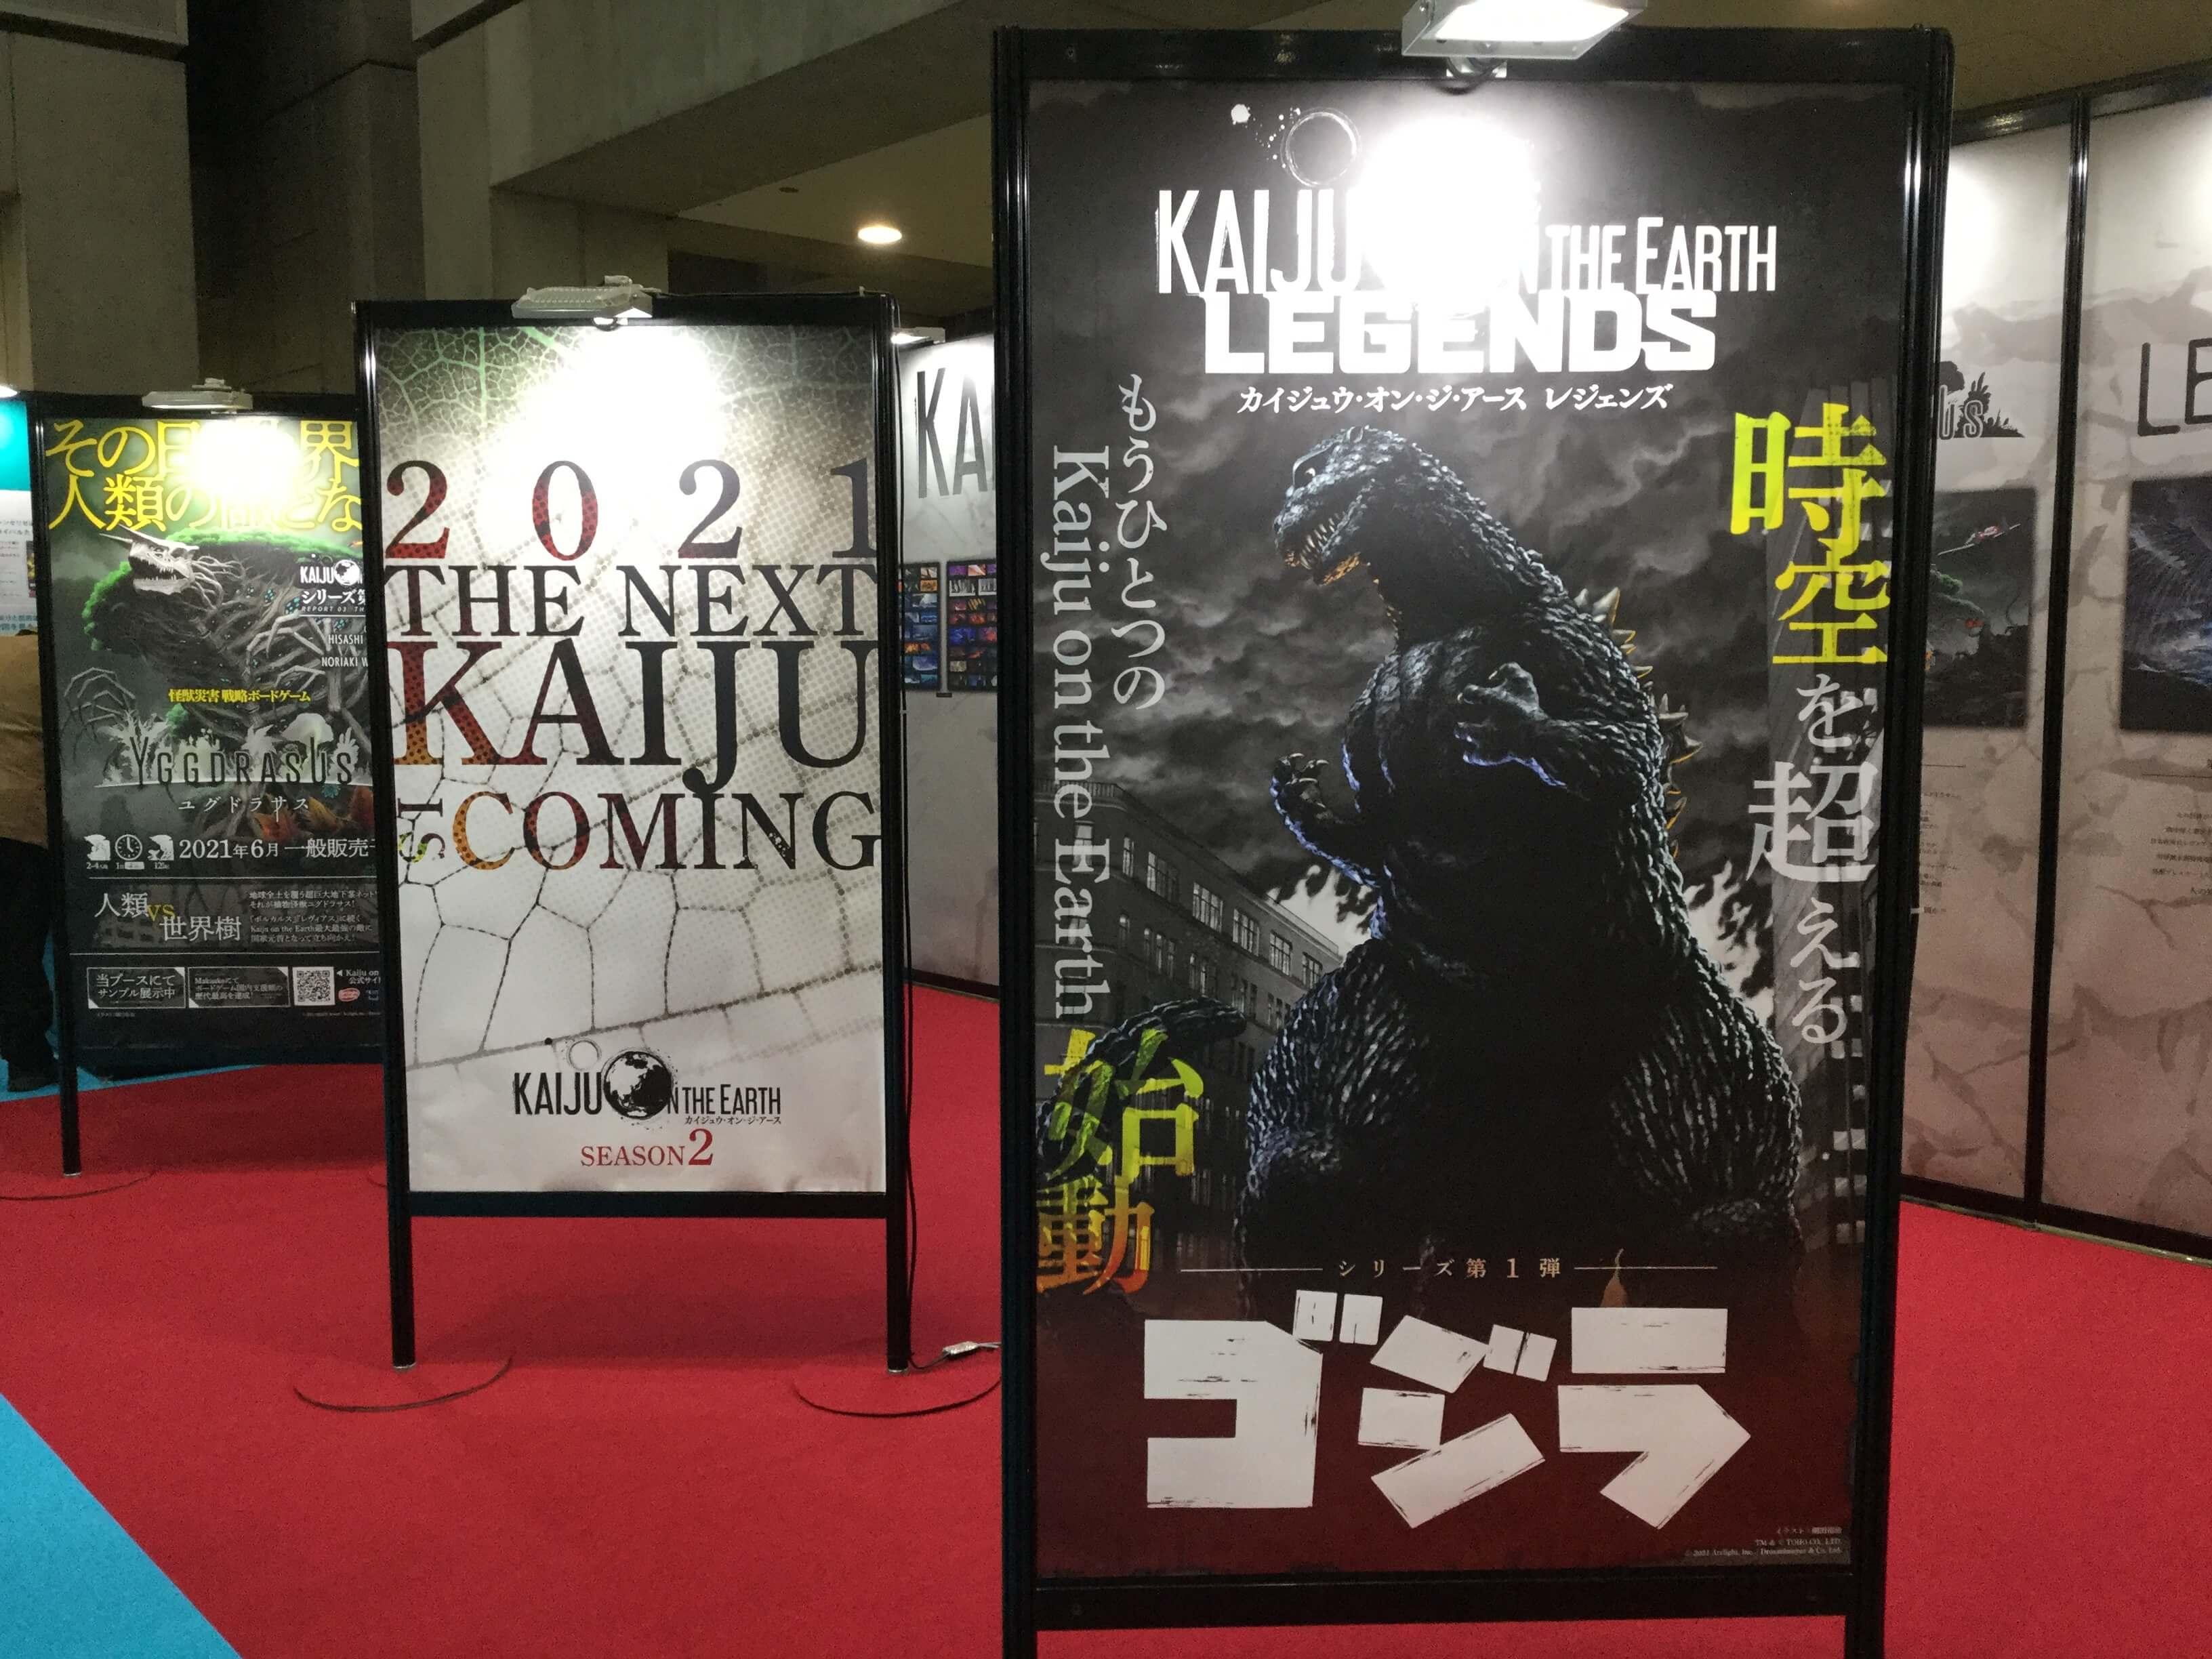 kaiju-on-the-earth-legends-11-1-2